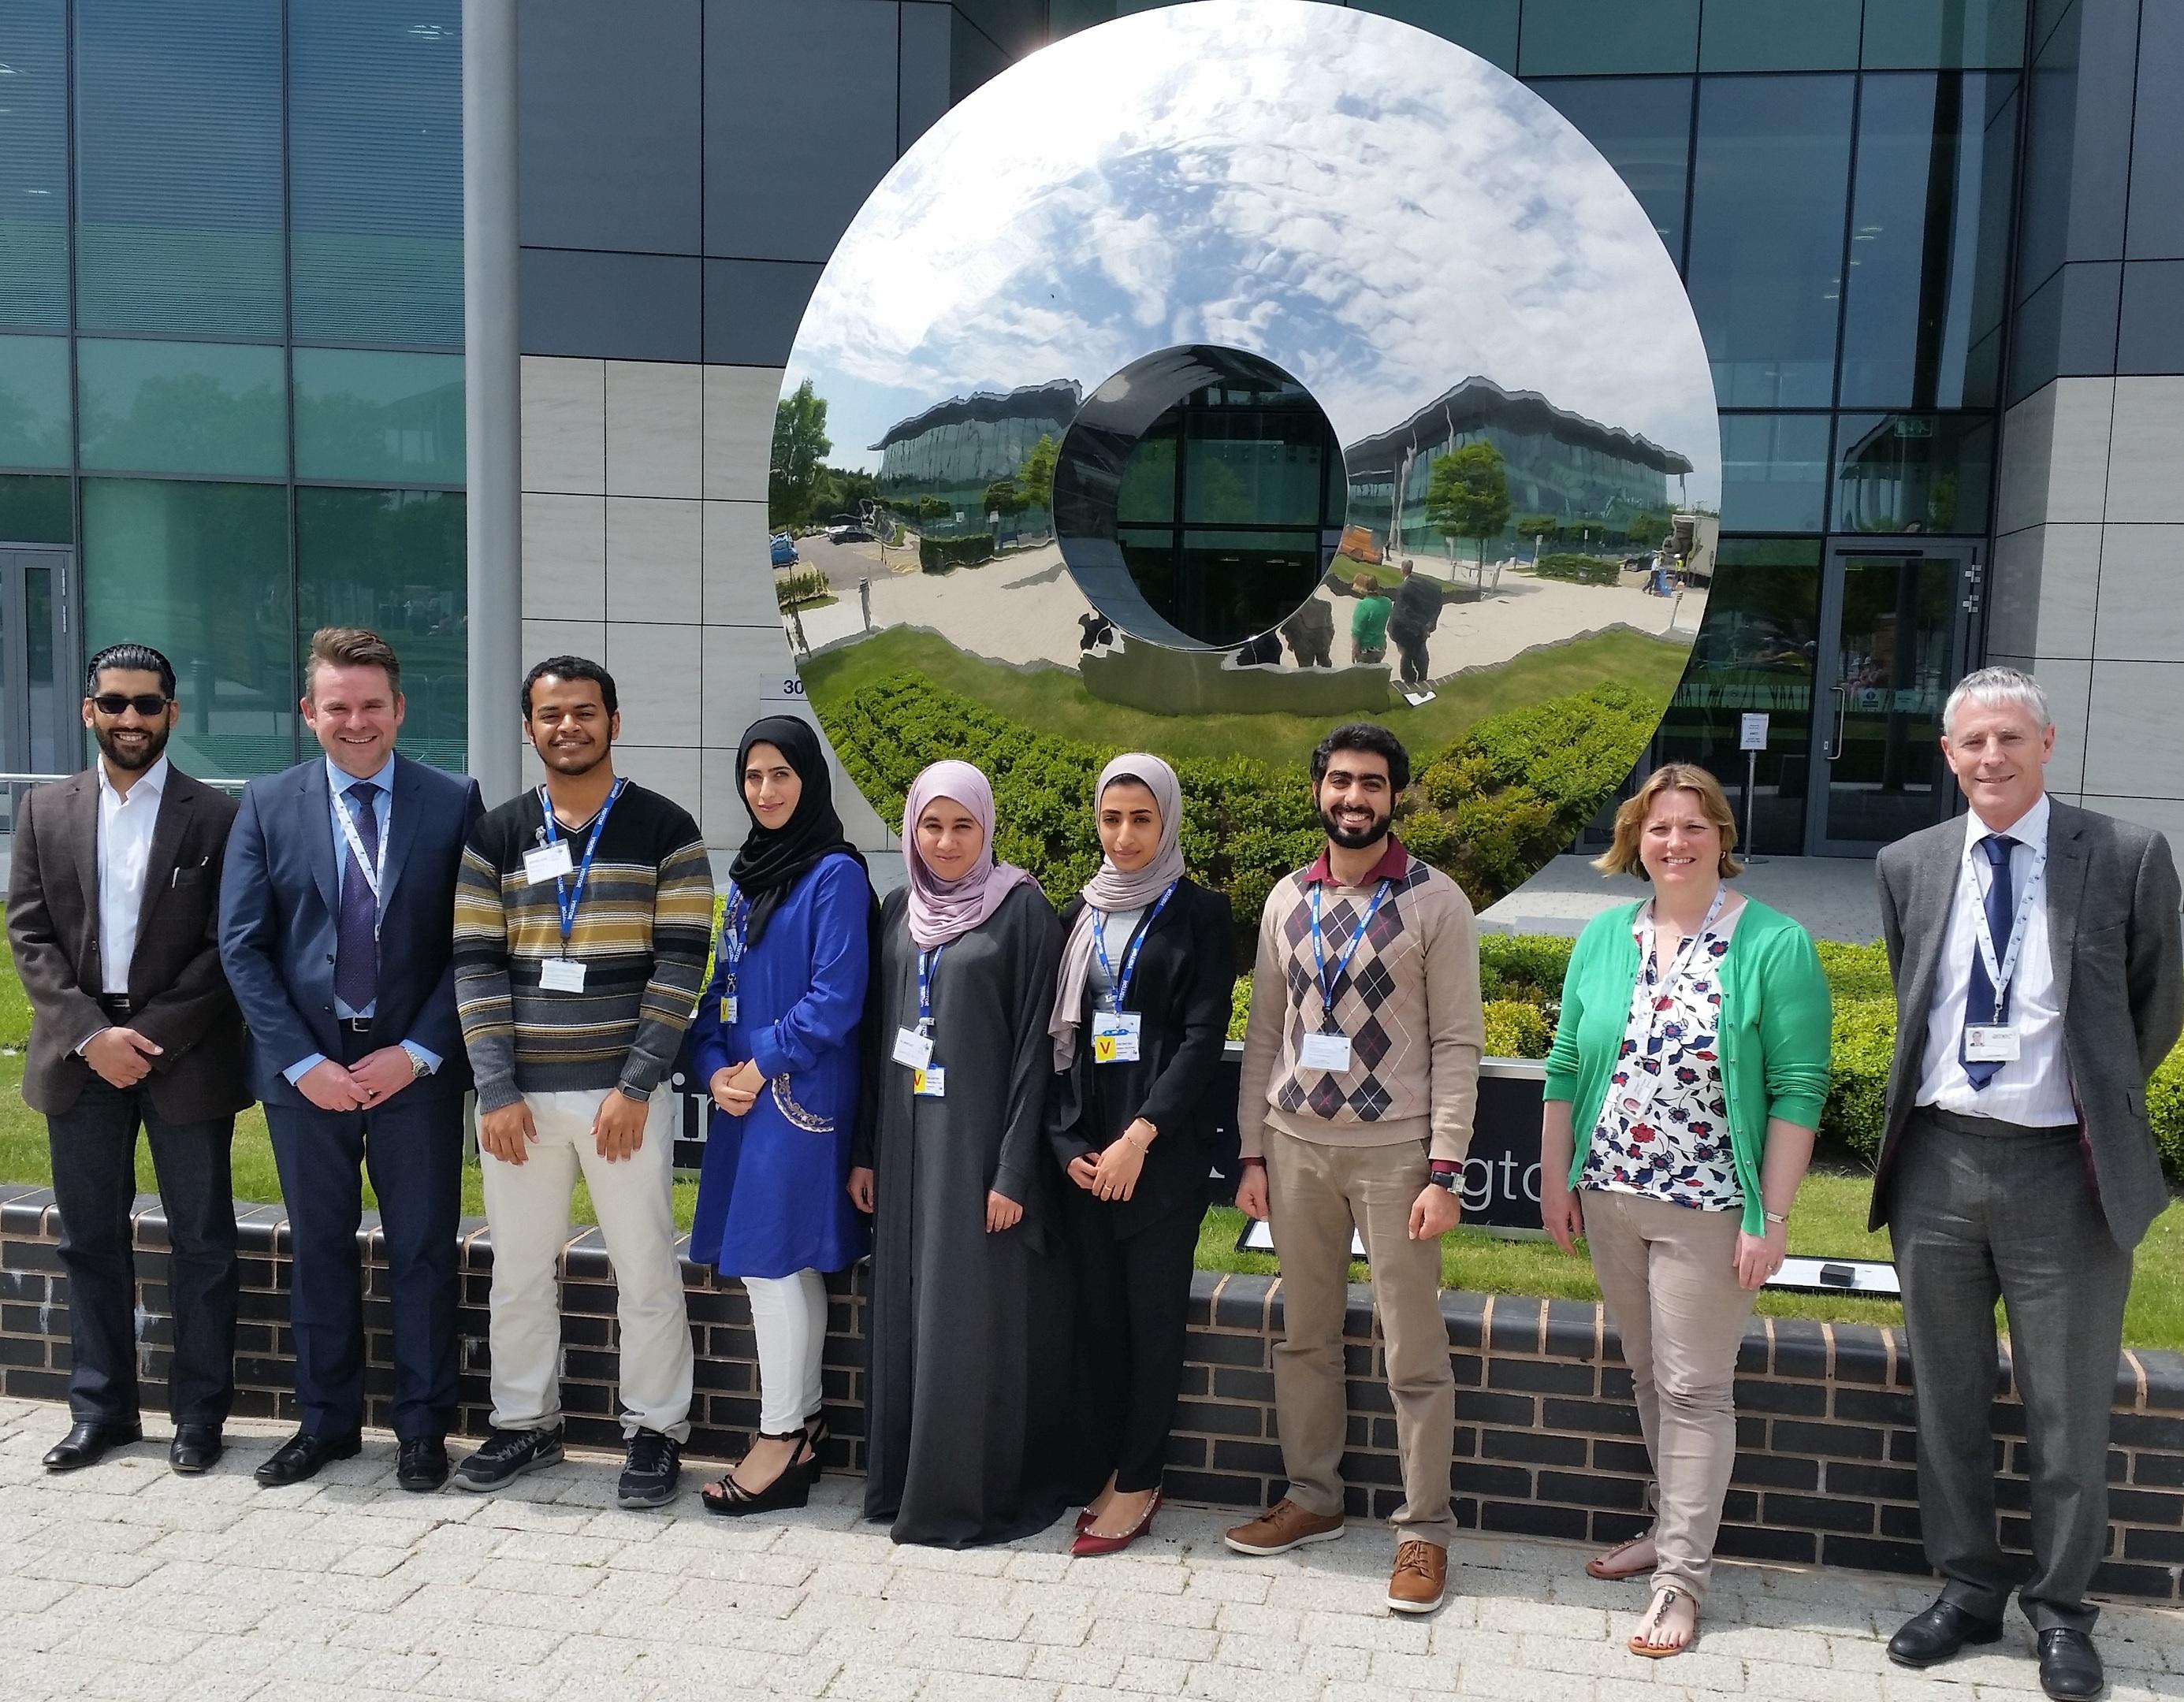 Amec Foster Wheeler welcomes Khalifa University students